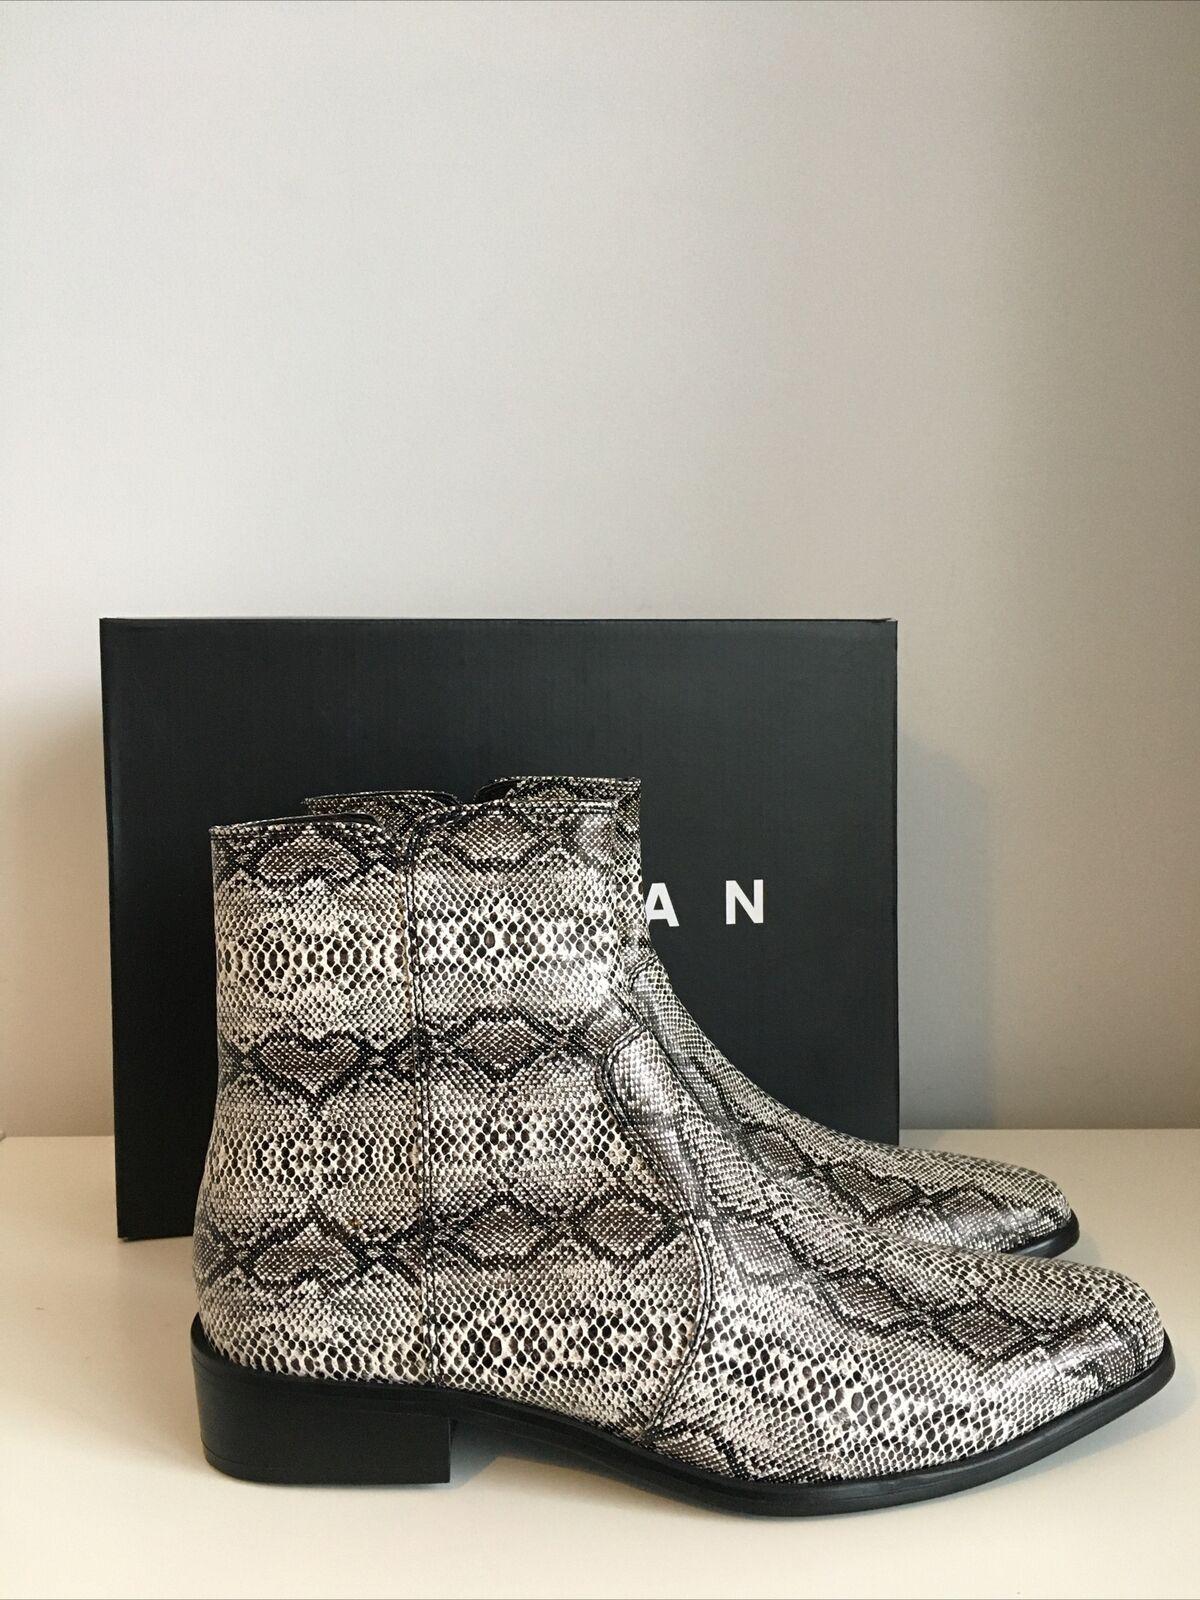 TOPMAN Brave Western Boots Cowboy Ankle Boot UK 7 / 41 BNIB Snake Print rrp